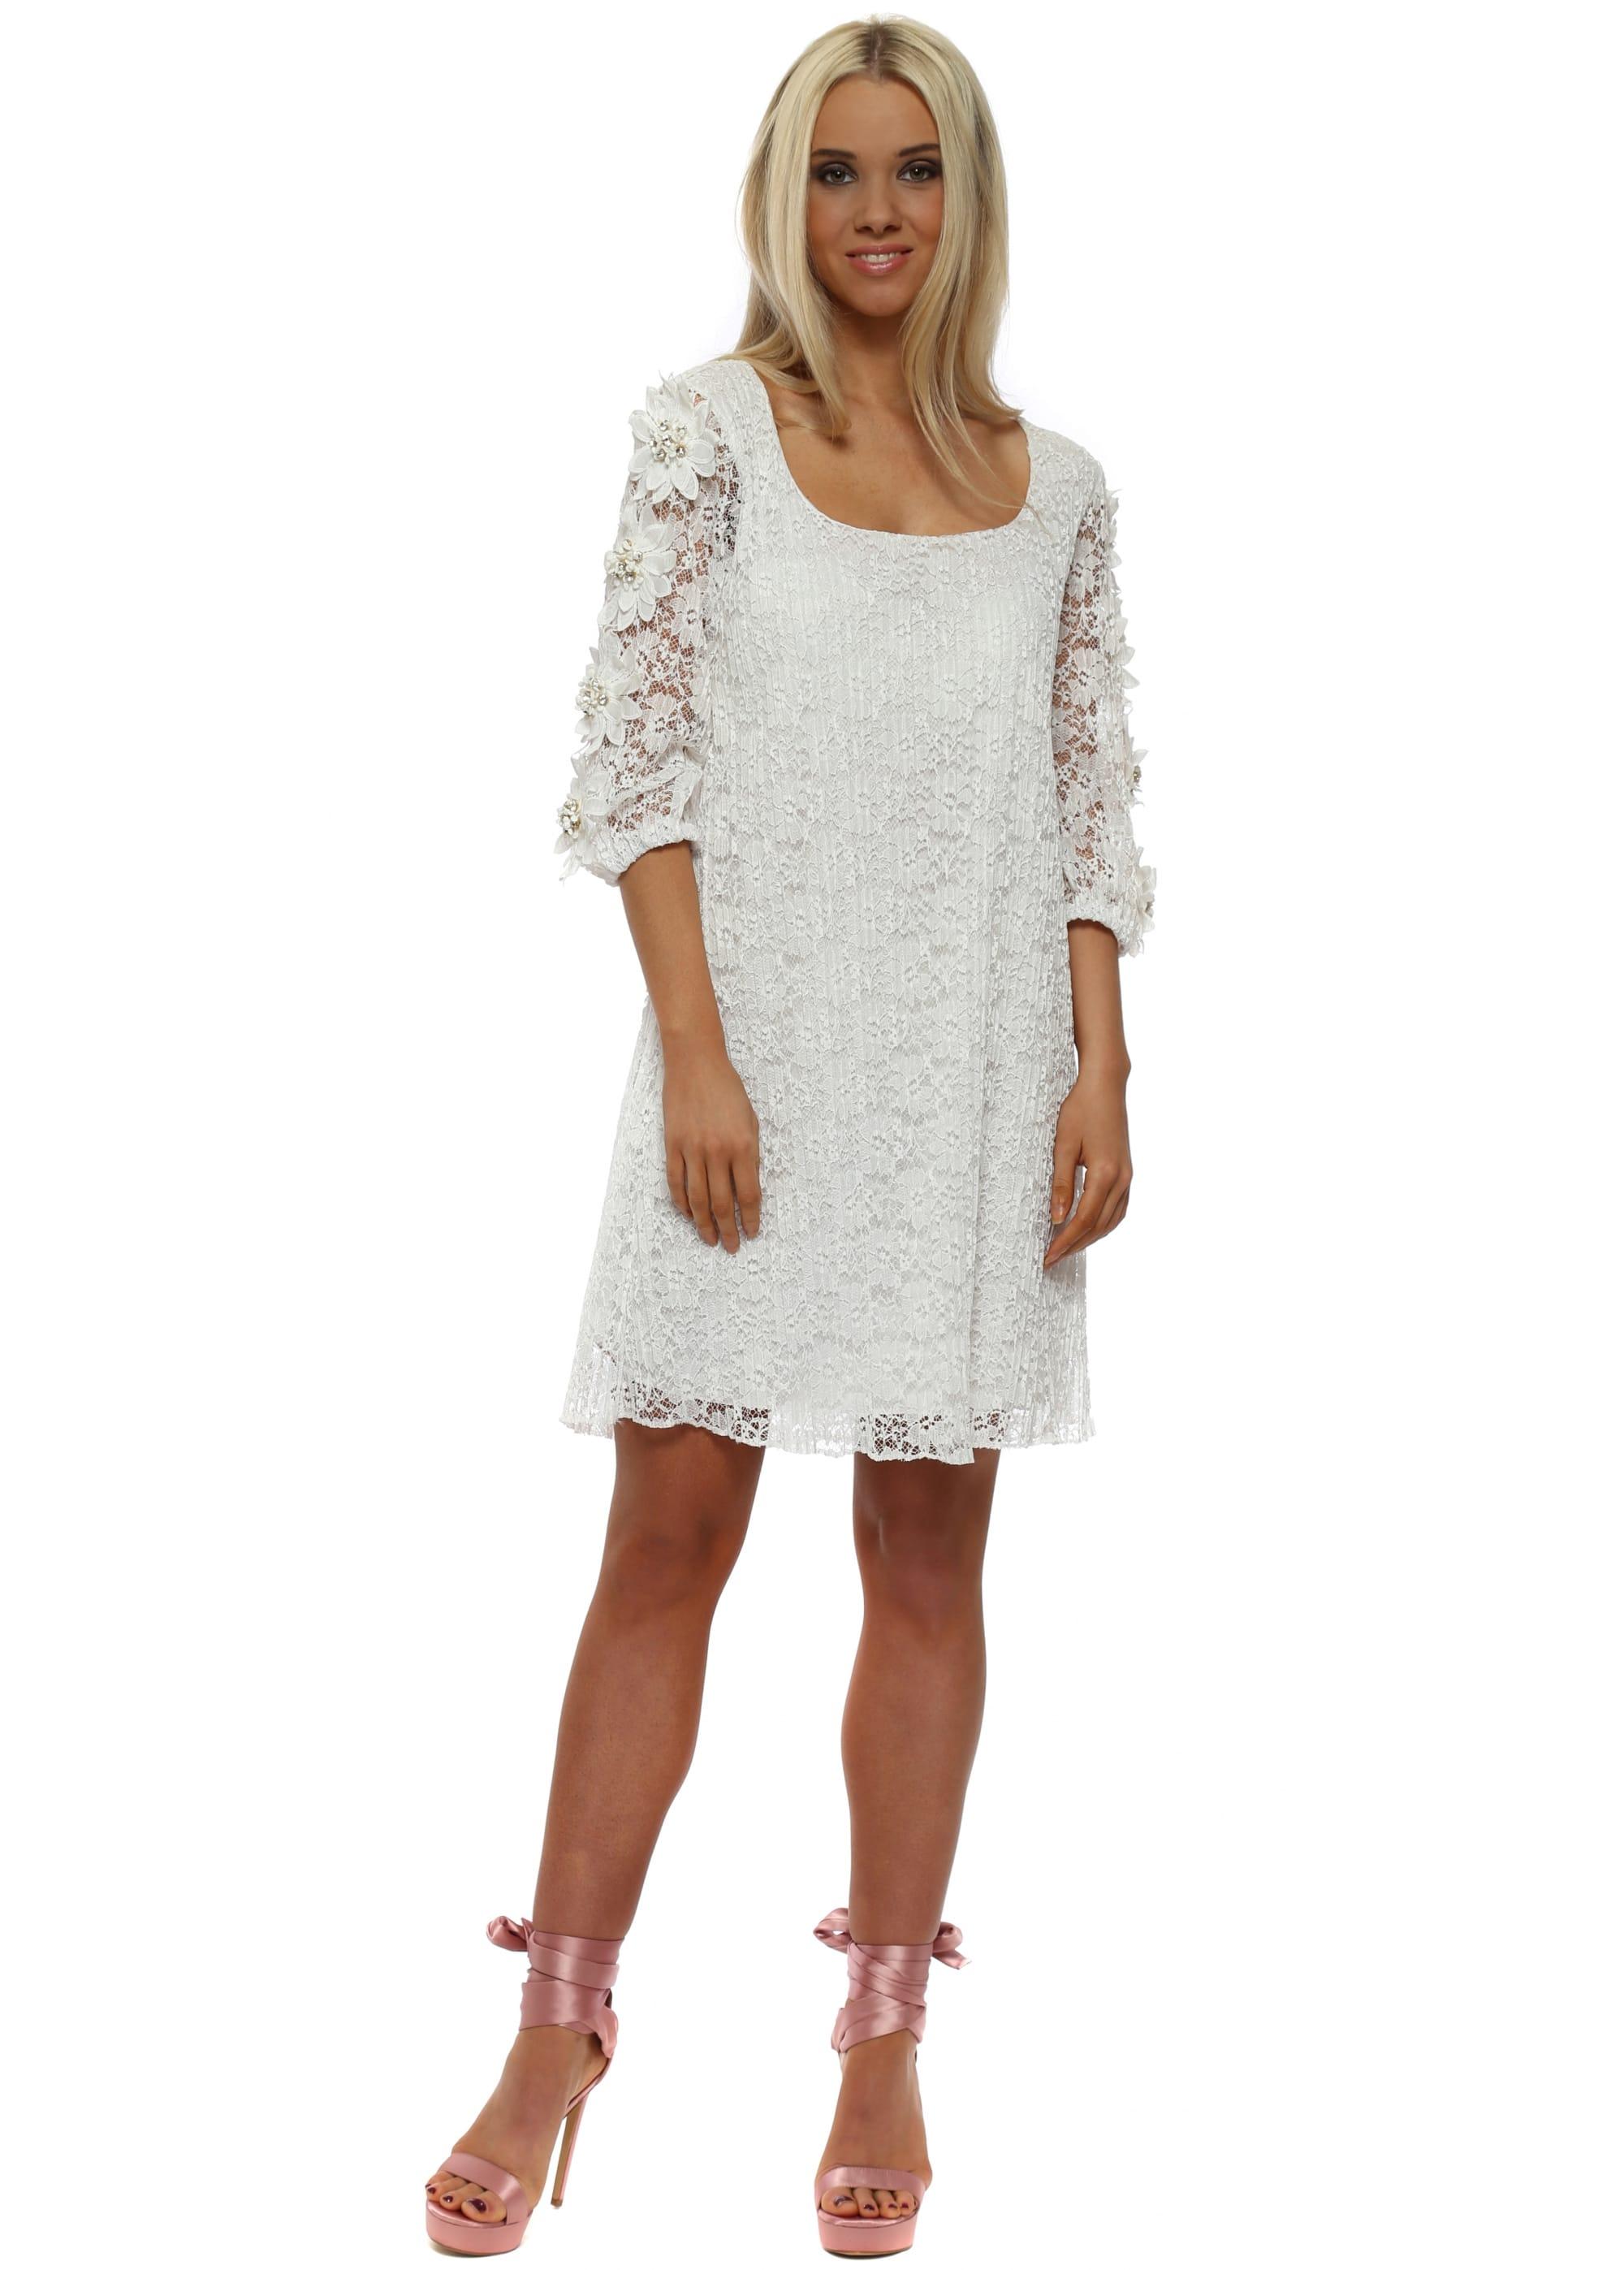 627c953883c9 White Lace Floral Diamante Sleeve Tunic Dress